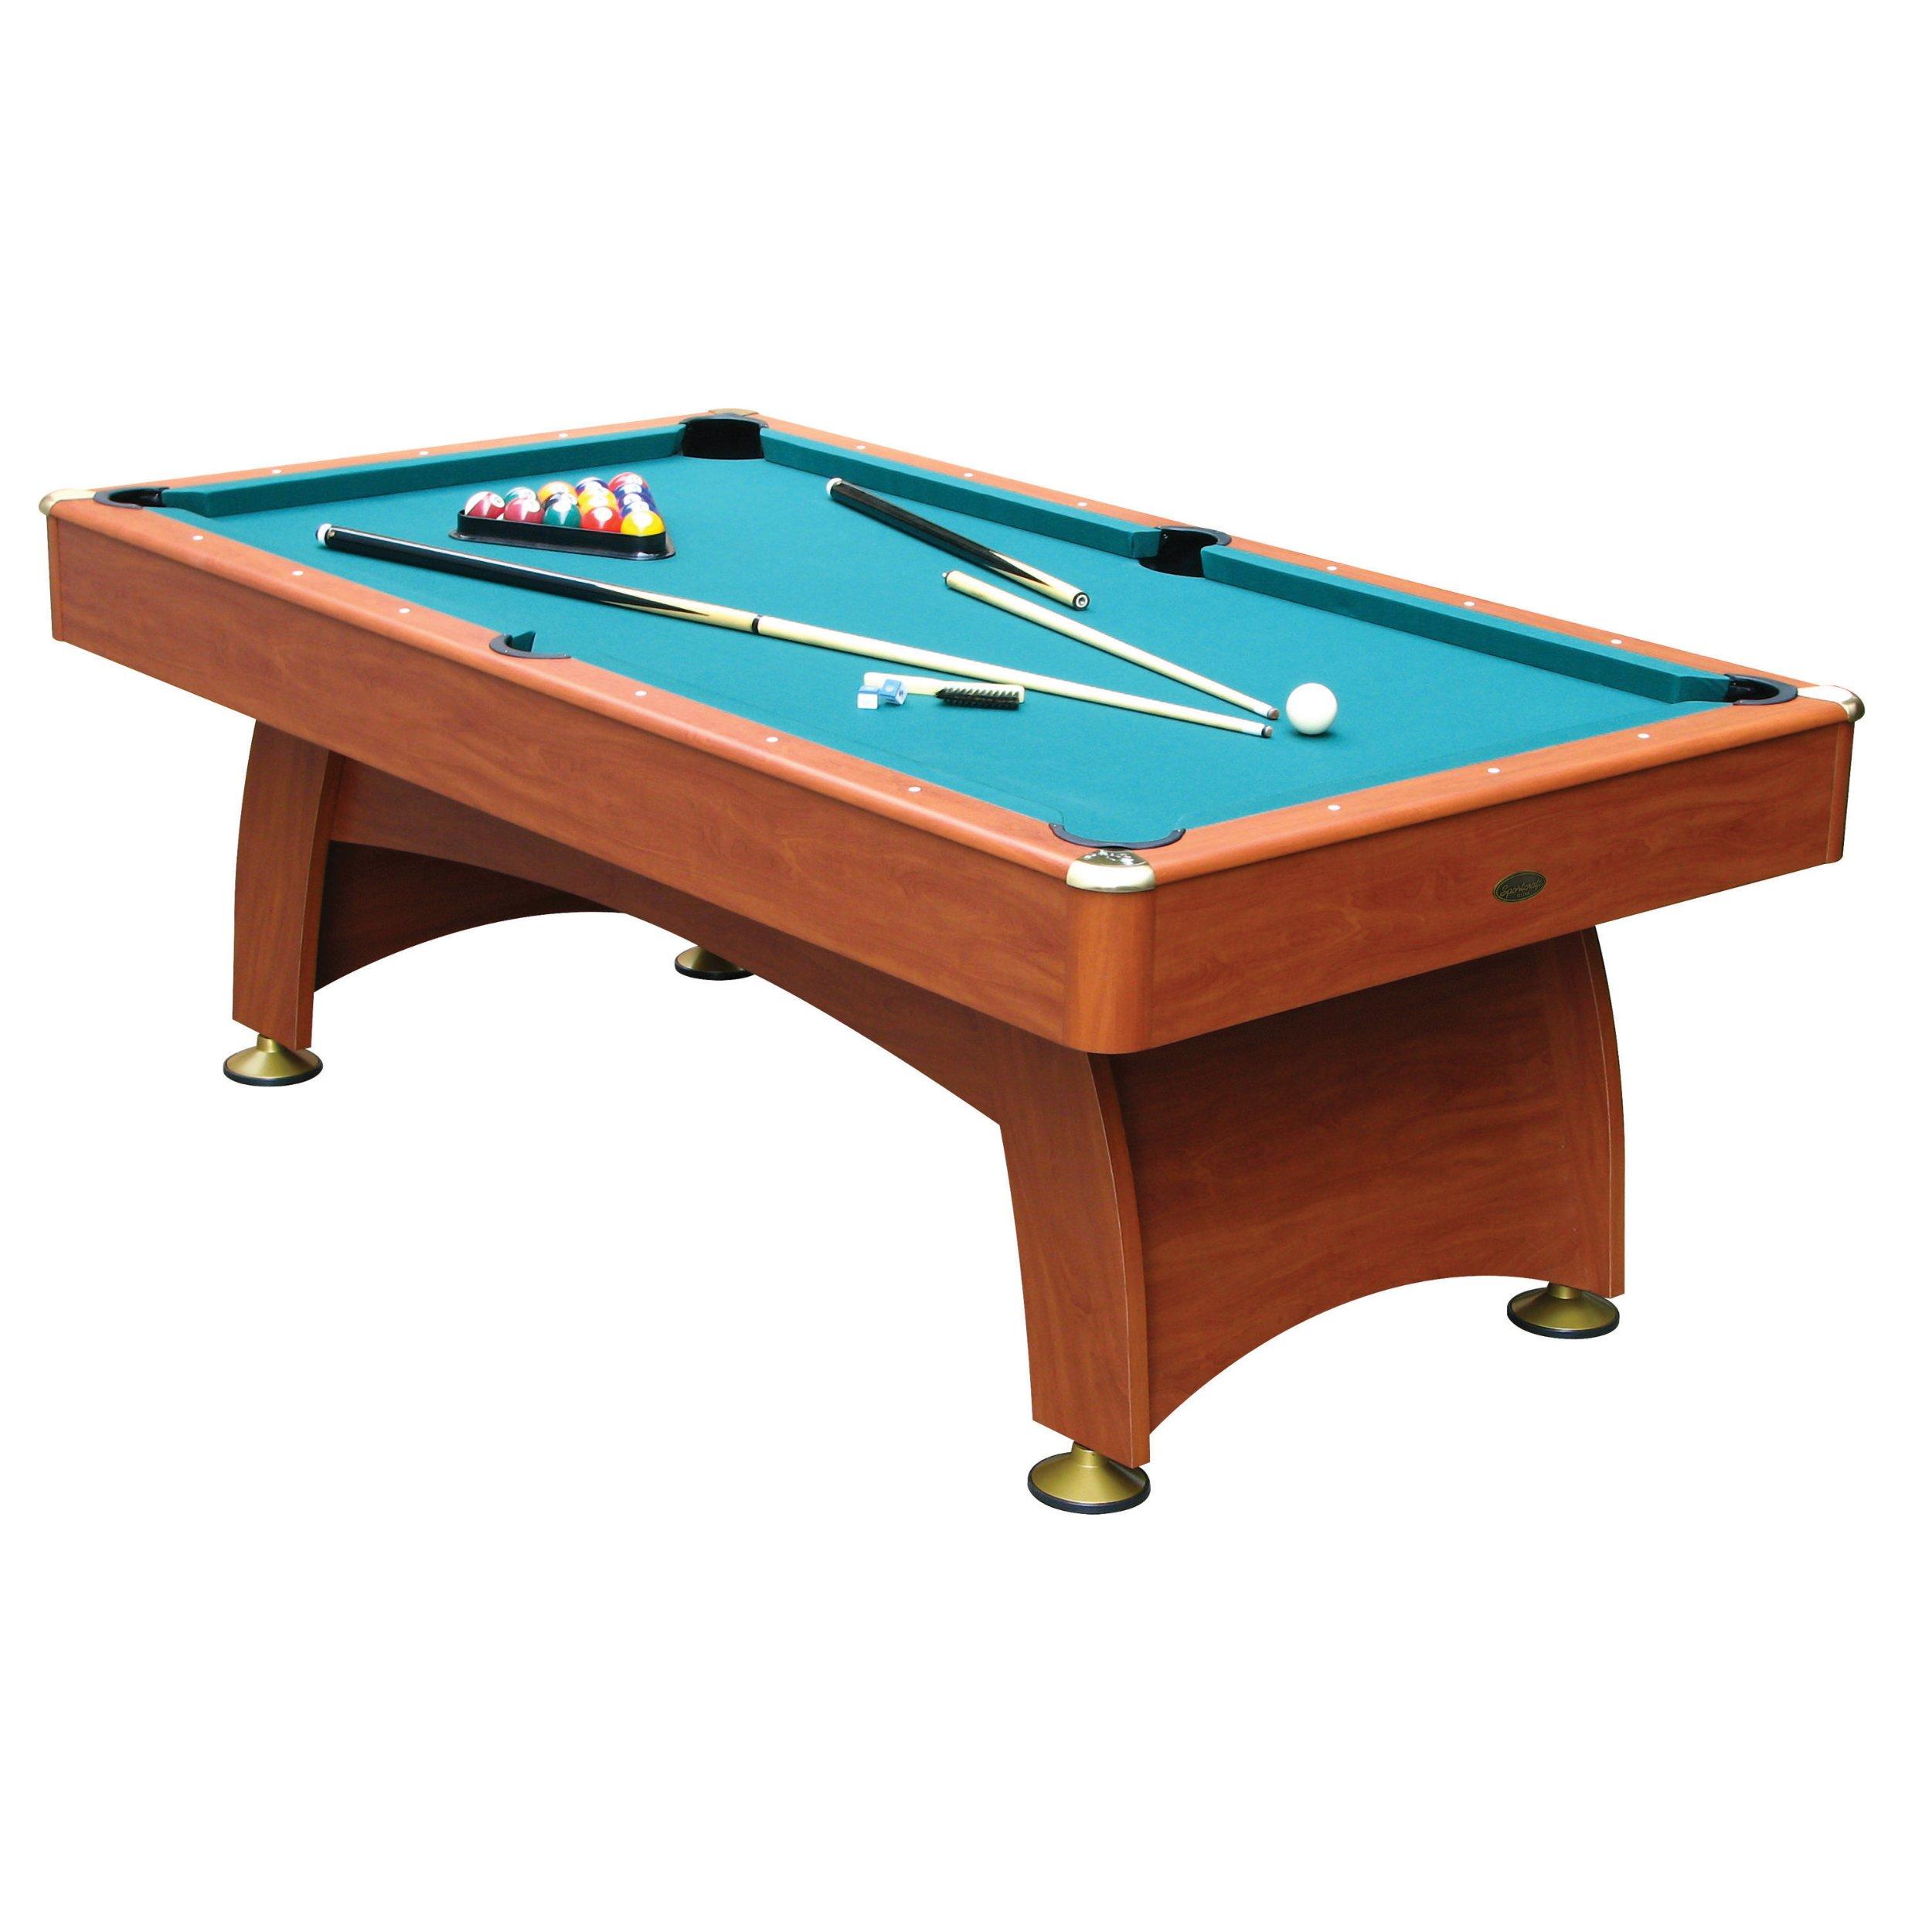 Sportcraft Cisco 2 in 1 Billiard / Table Tennis Table Combo